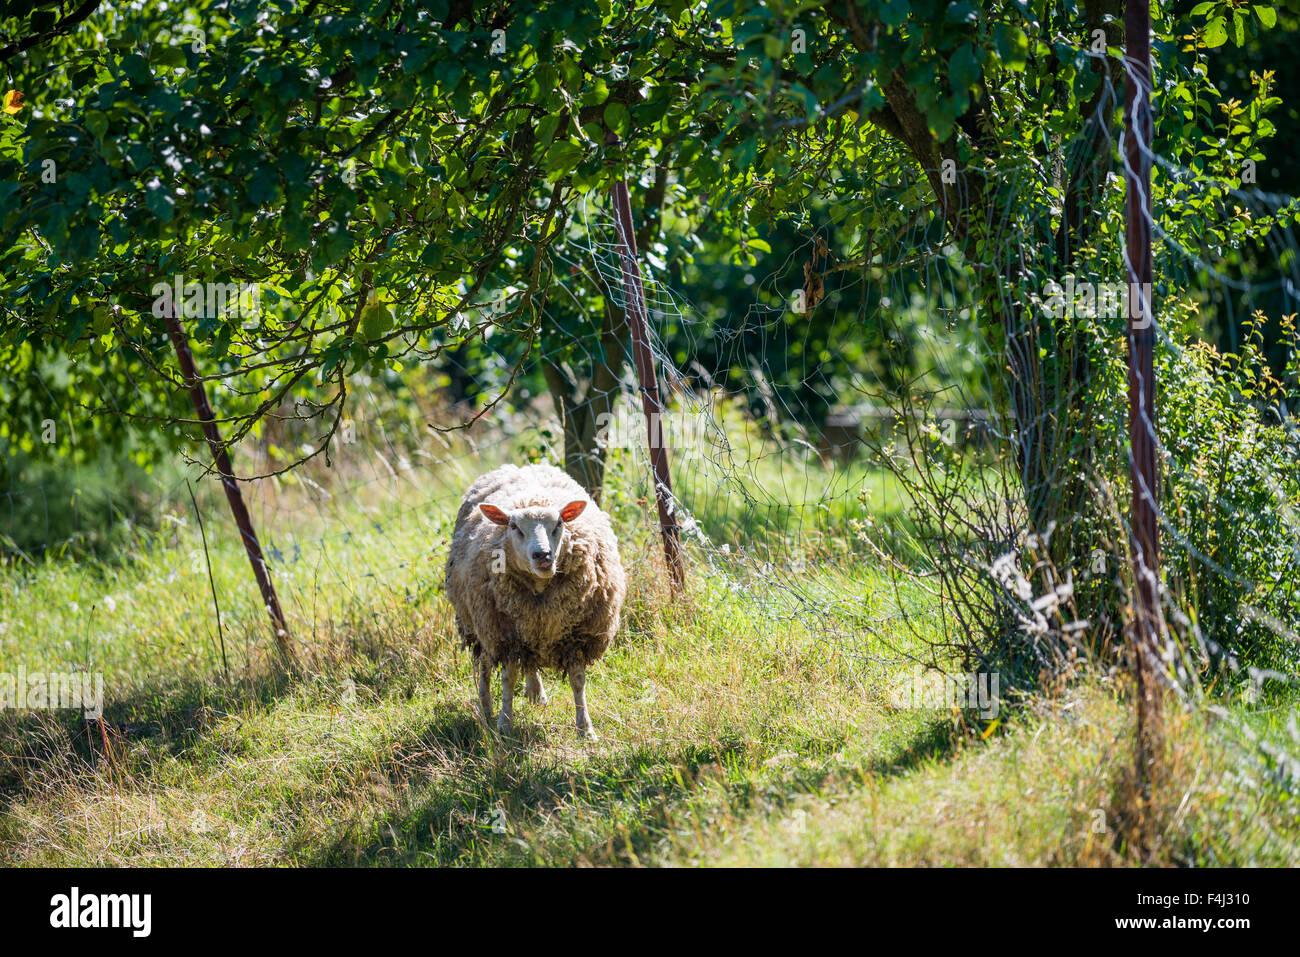 sheep on pasture, Czech republic - Stock Image